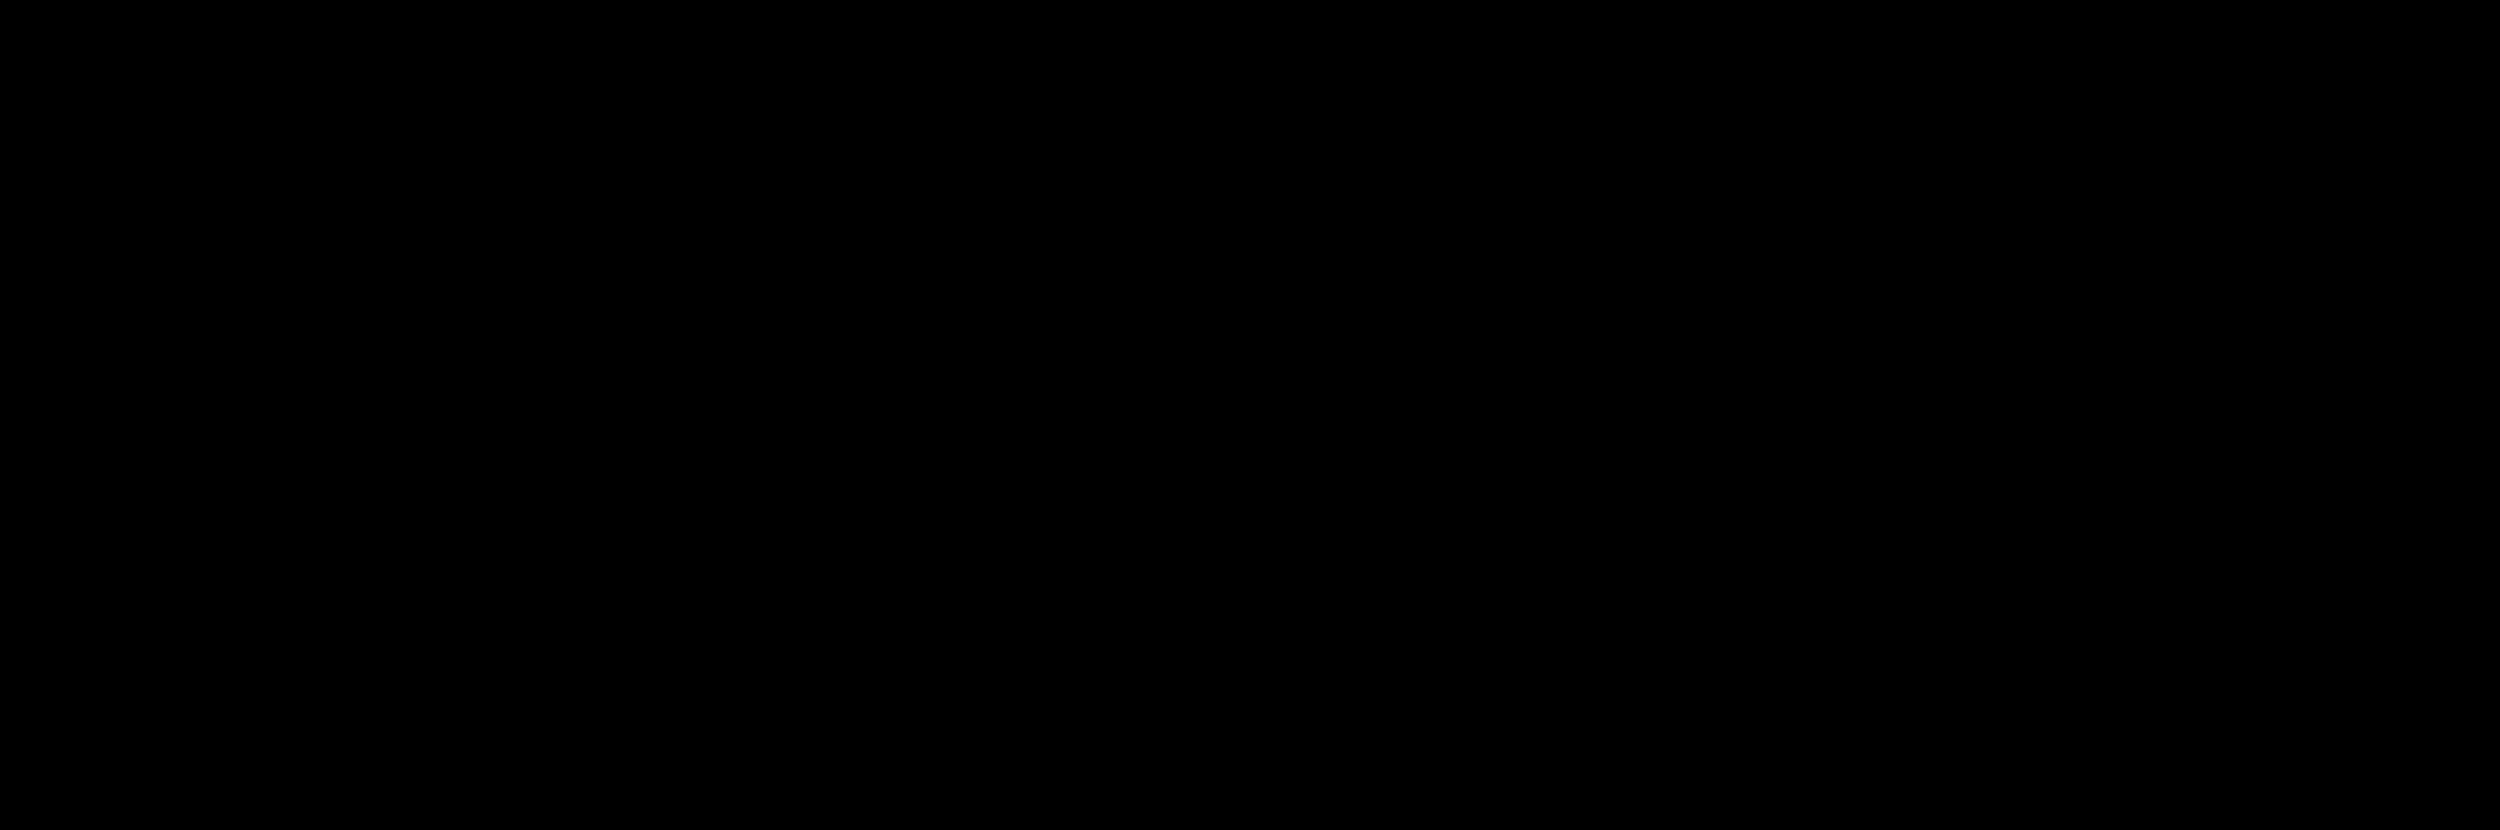 QLDC-01.png